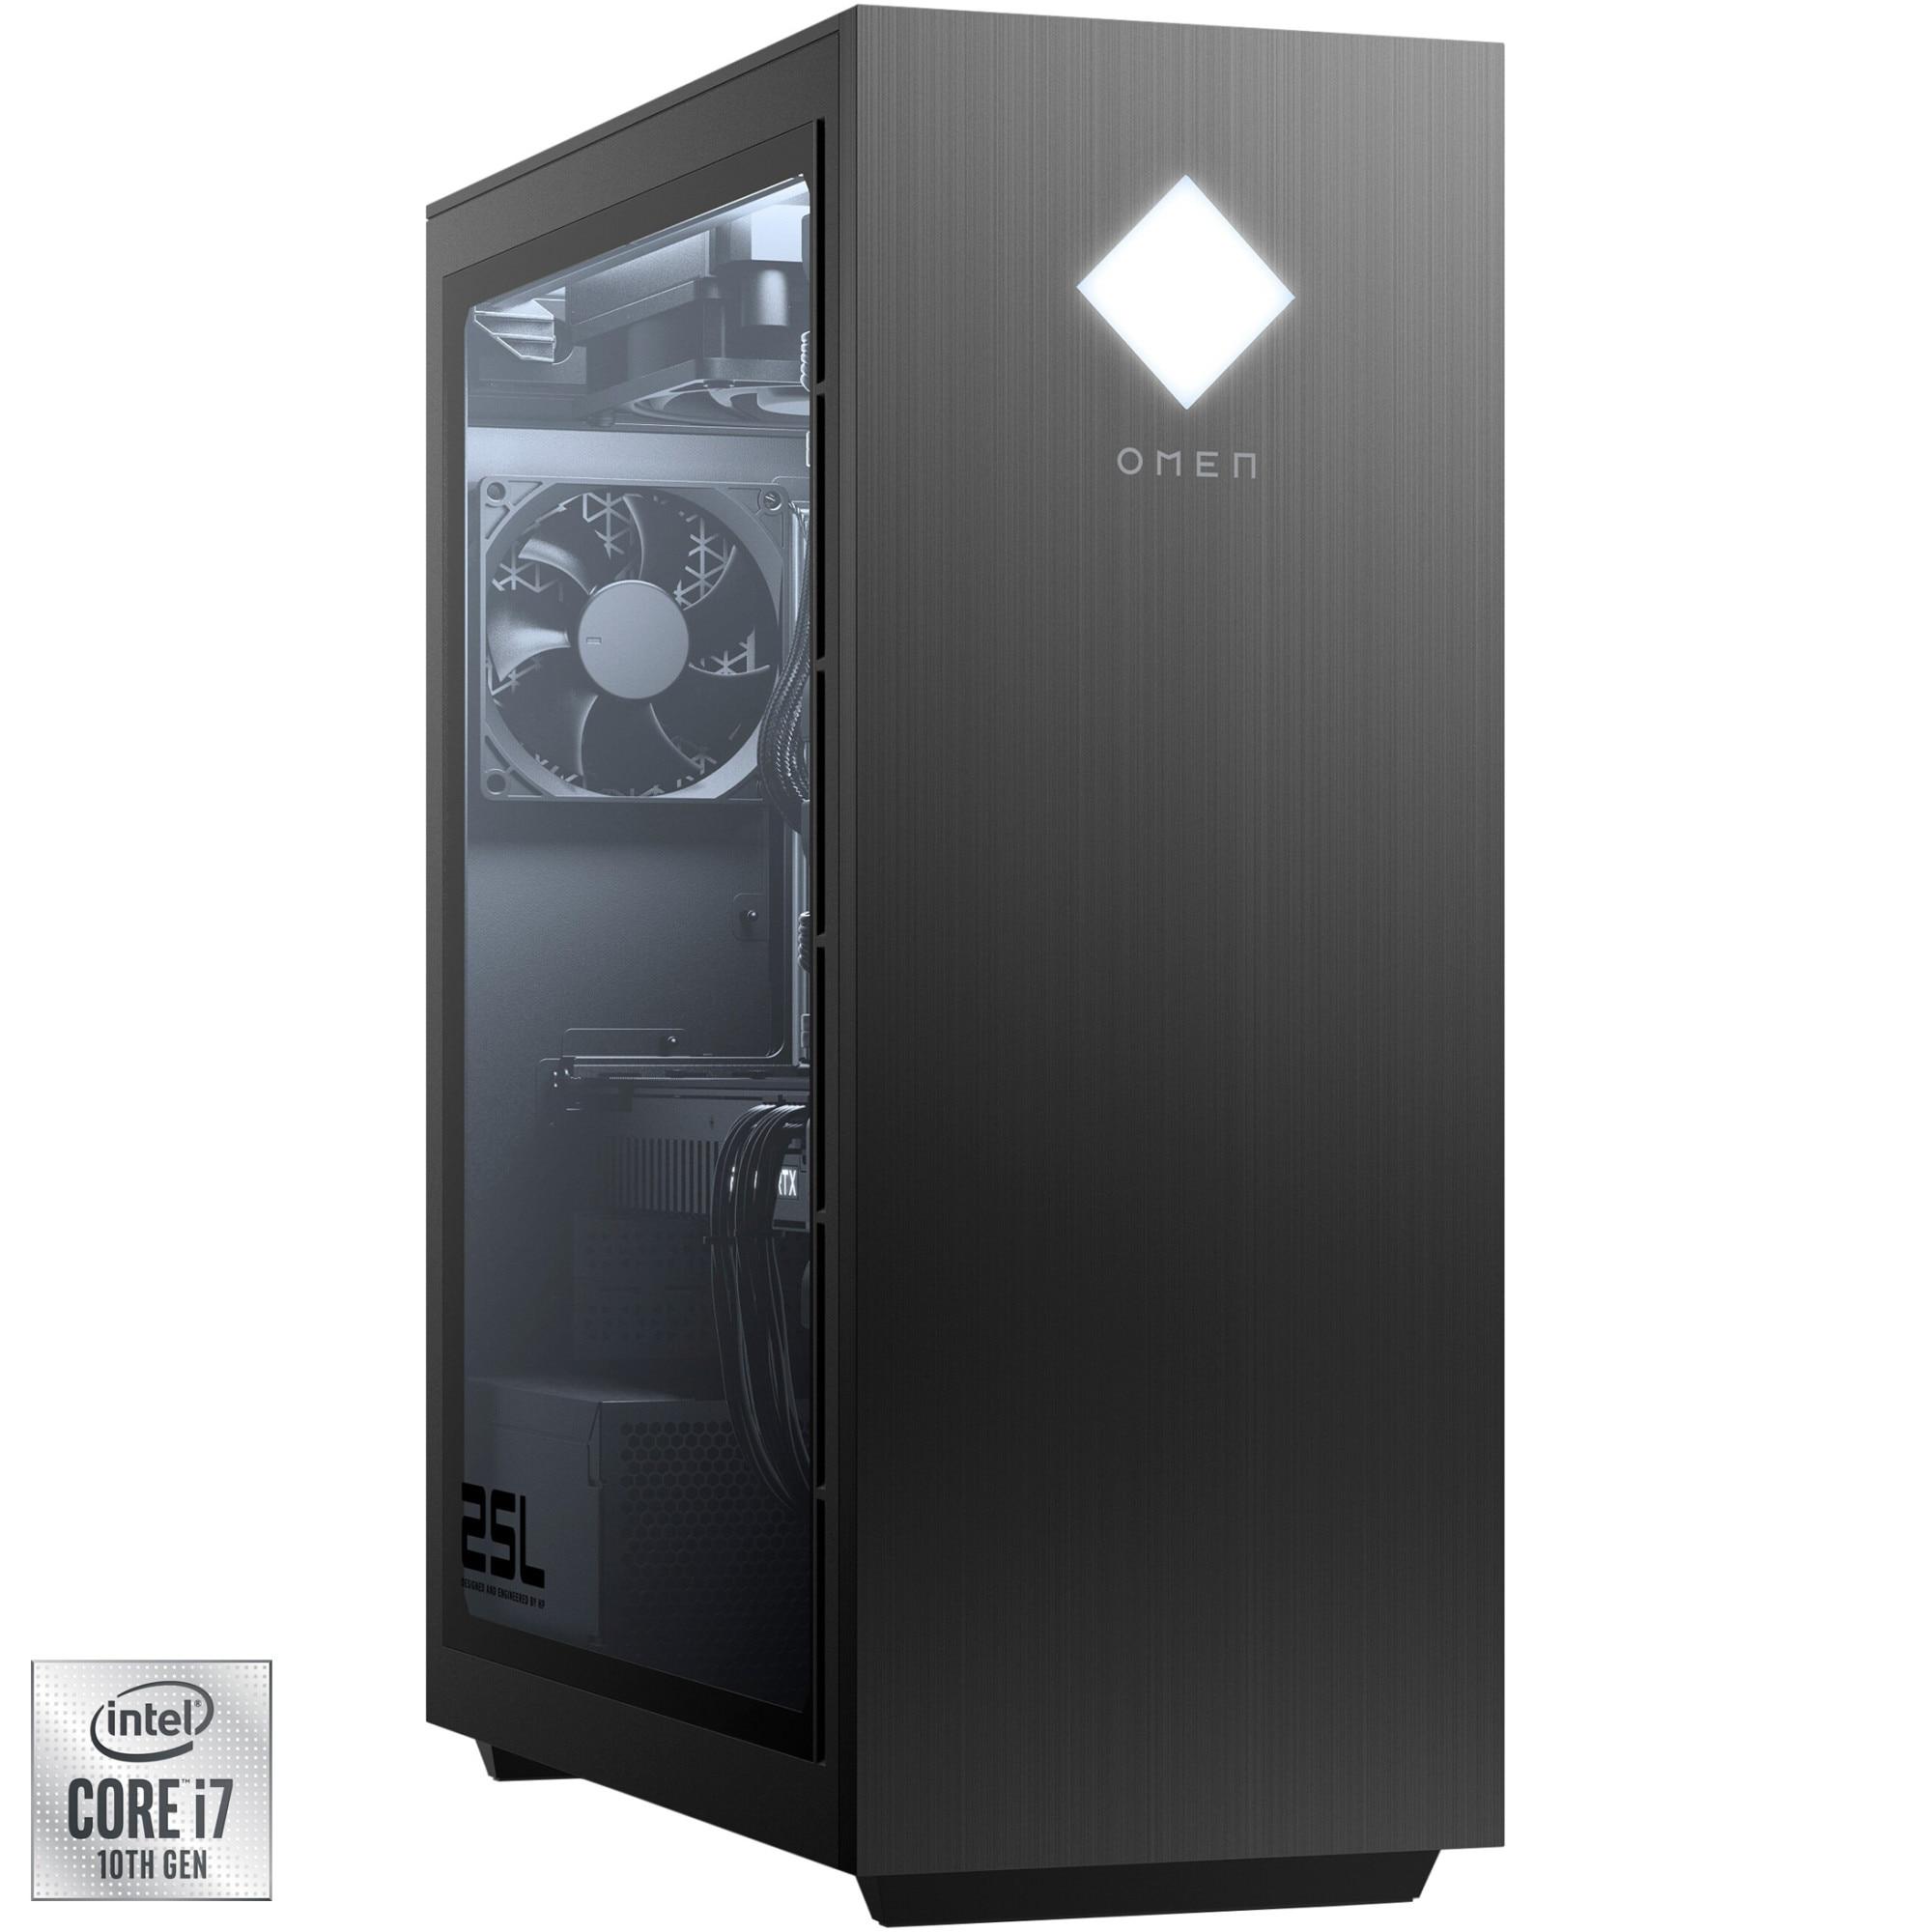 Fotografie Sistem Gaming OMEN by HP cu procesor Intel® Core™ i7-10700 pana la 4.80 GHz, Comet Lake, 16GB DDR4, 1TB SSD, NVIDIA GeForce RTX 3070 8GB, Free DOS